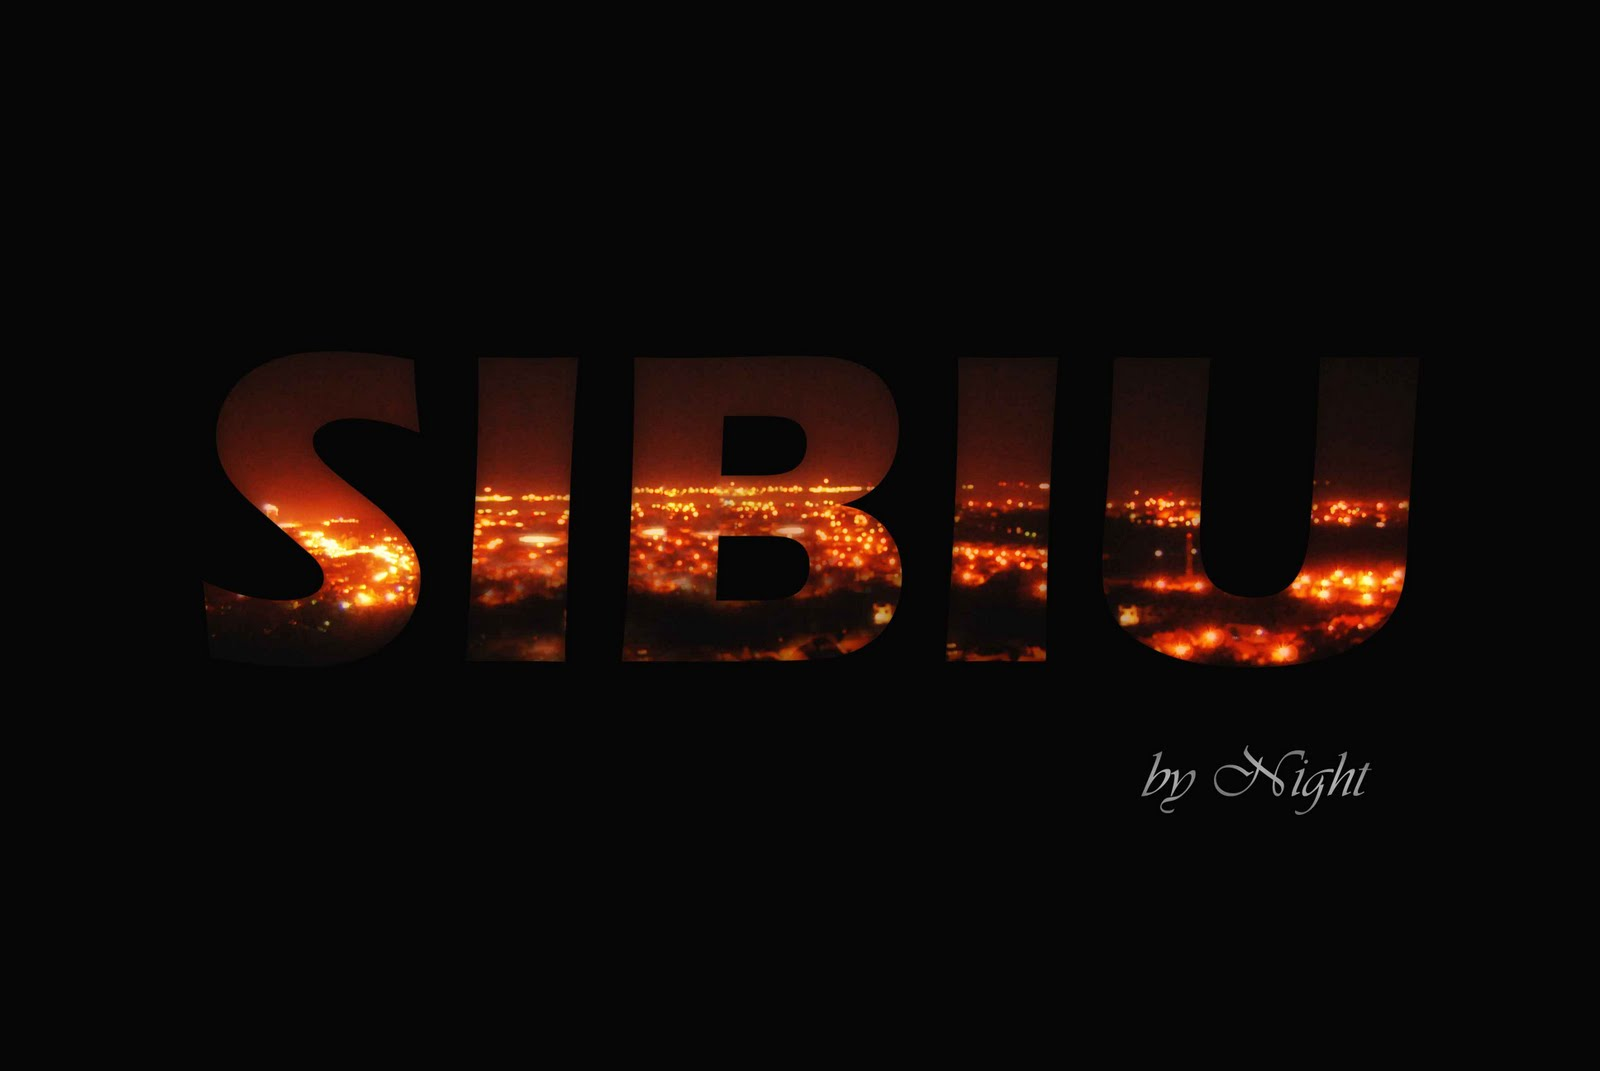 http://2.bp.blogspot.com/_DYOTf0Z50jU/Sw2WF5ZfZVI/AAAAAAAAAIg/TX224sP6qHc/s1600/sibiu-by-night-ok2.jpg